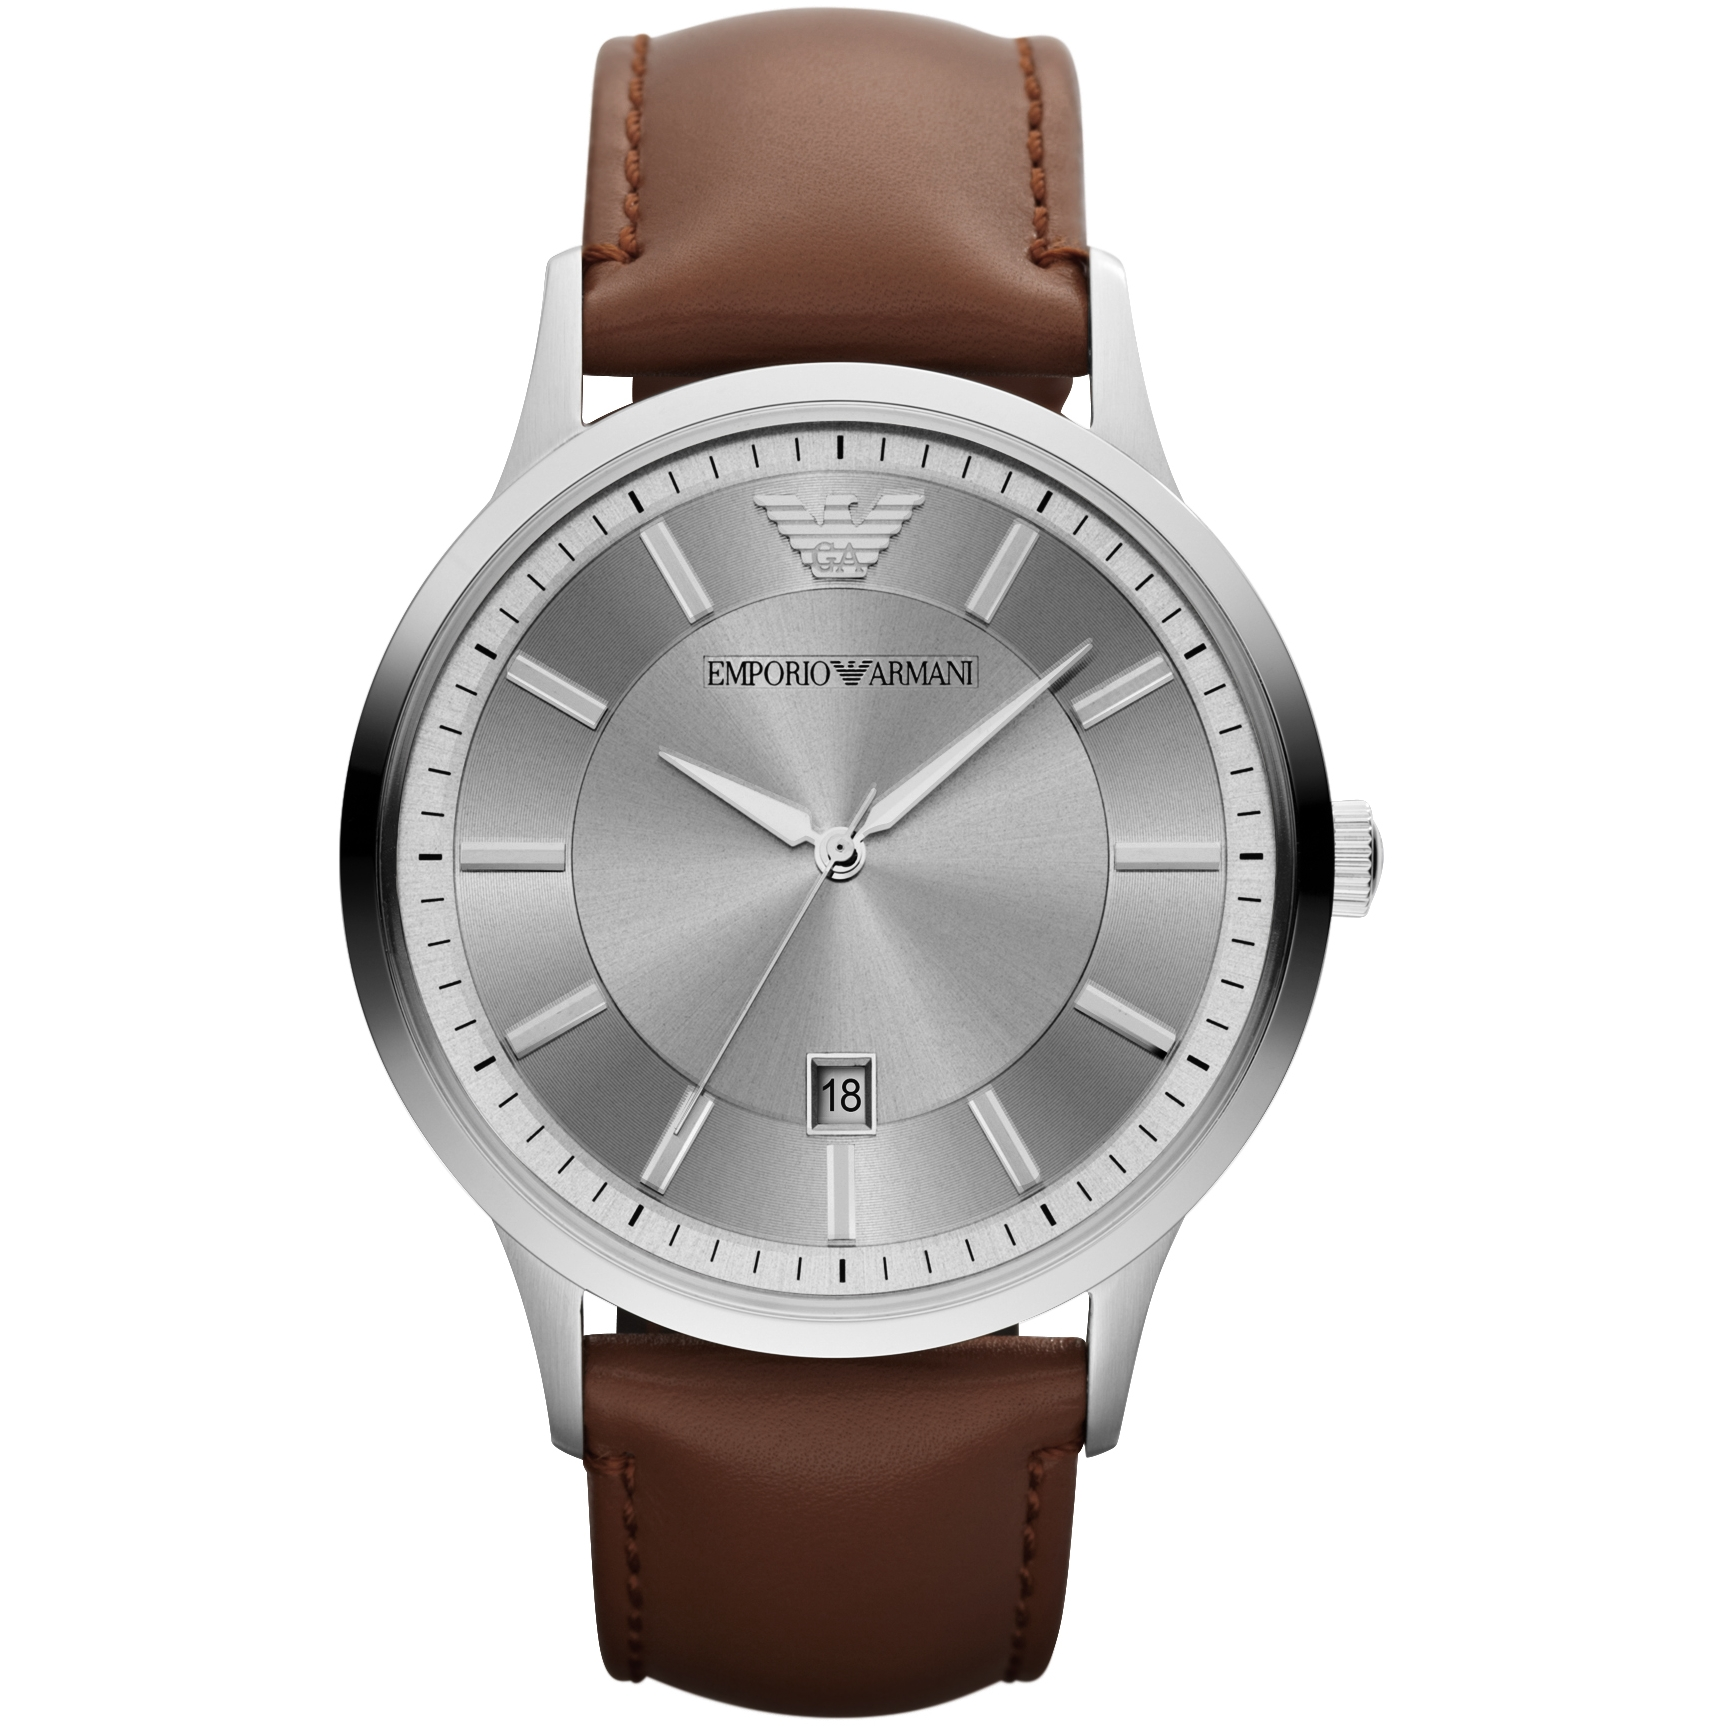 9d28c3122ae Gents Emporio Armani Watch (AR2463)